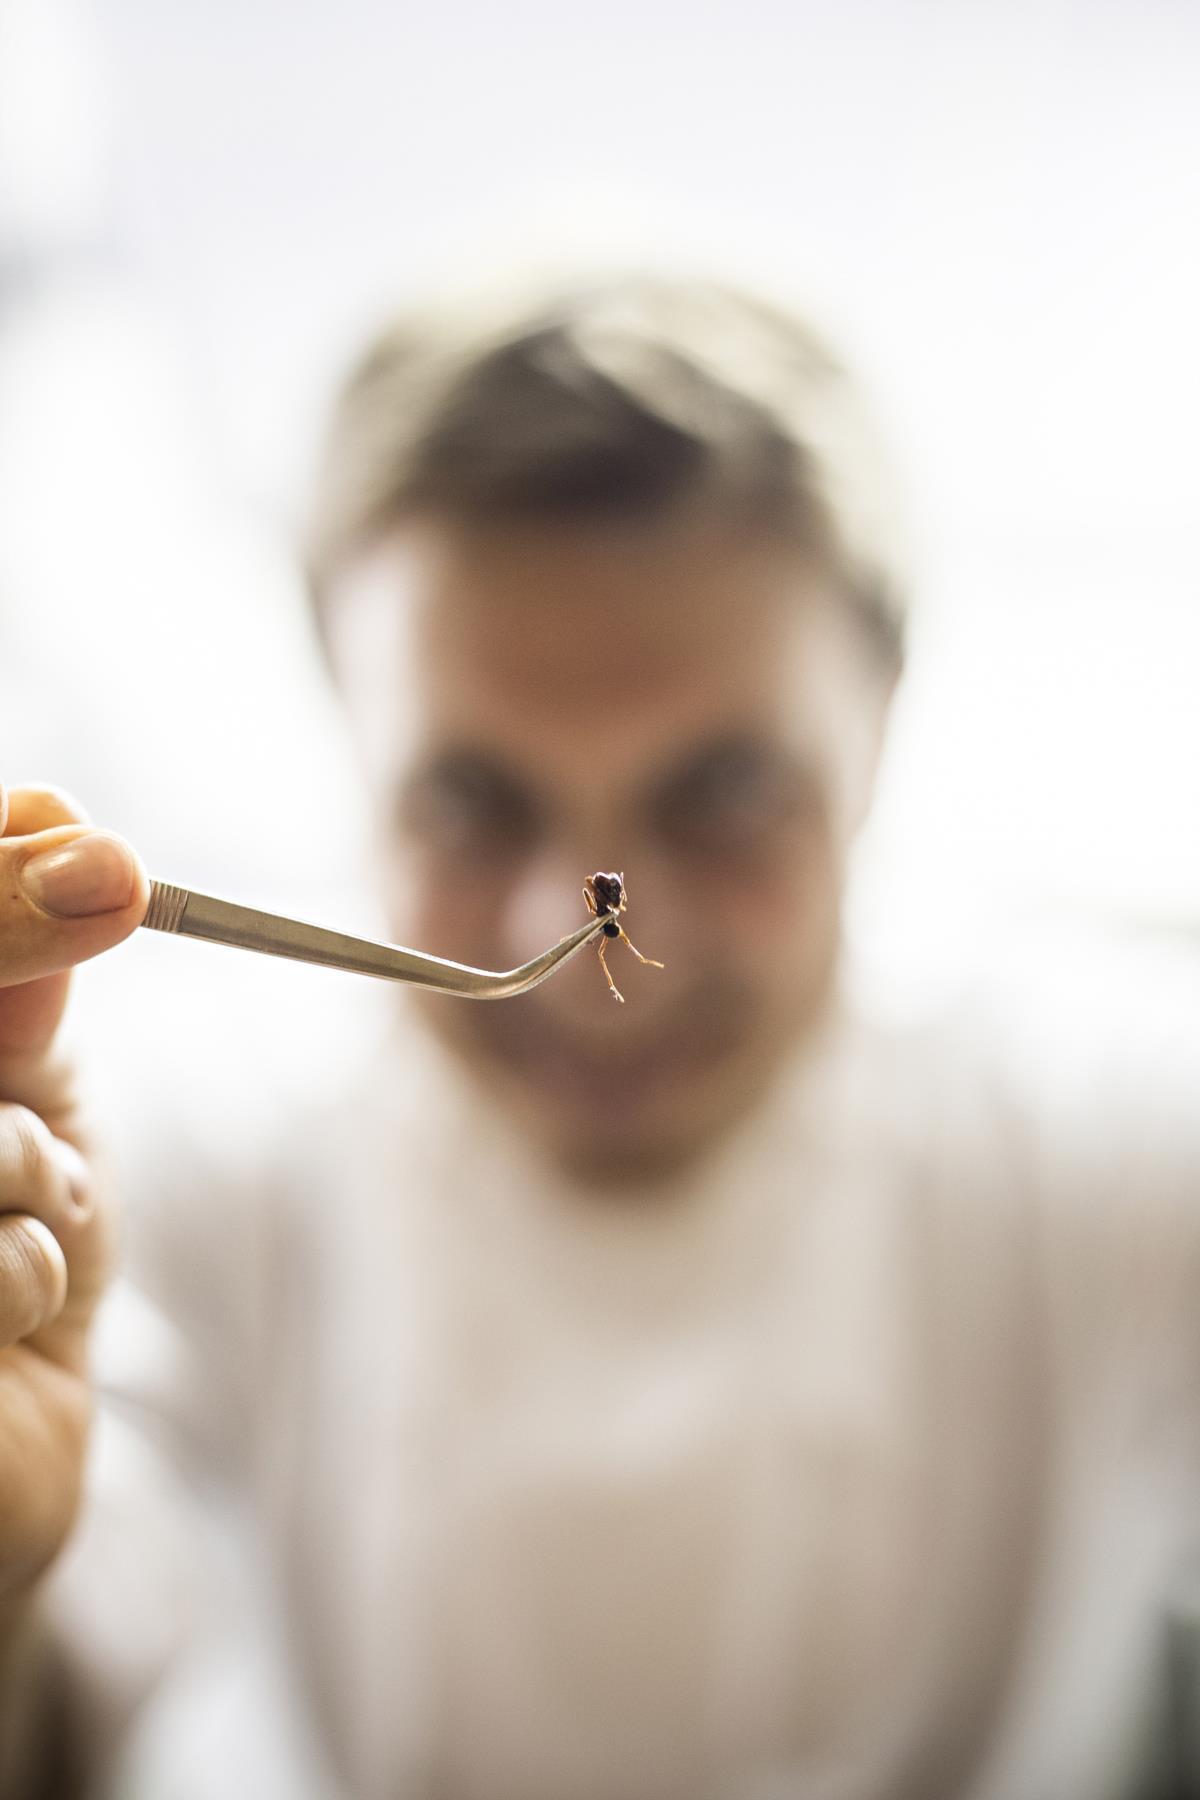 Chef Felipe Schaedler mostra as formigas da Amazónia que usa no seu restaurante Banzeiro. Estado do Amazonas, Manaus